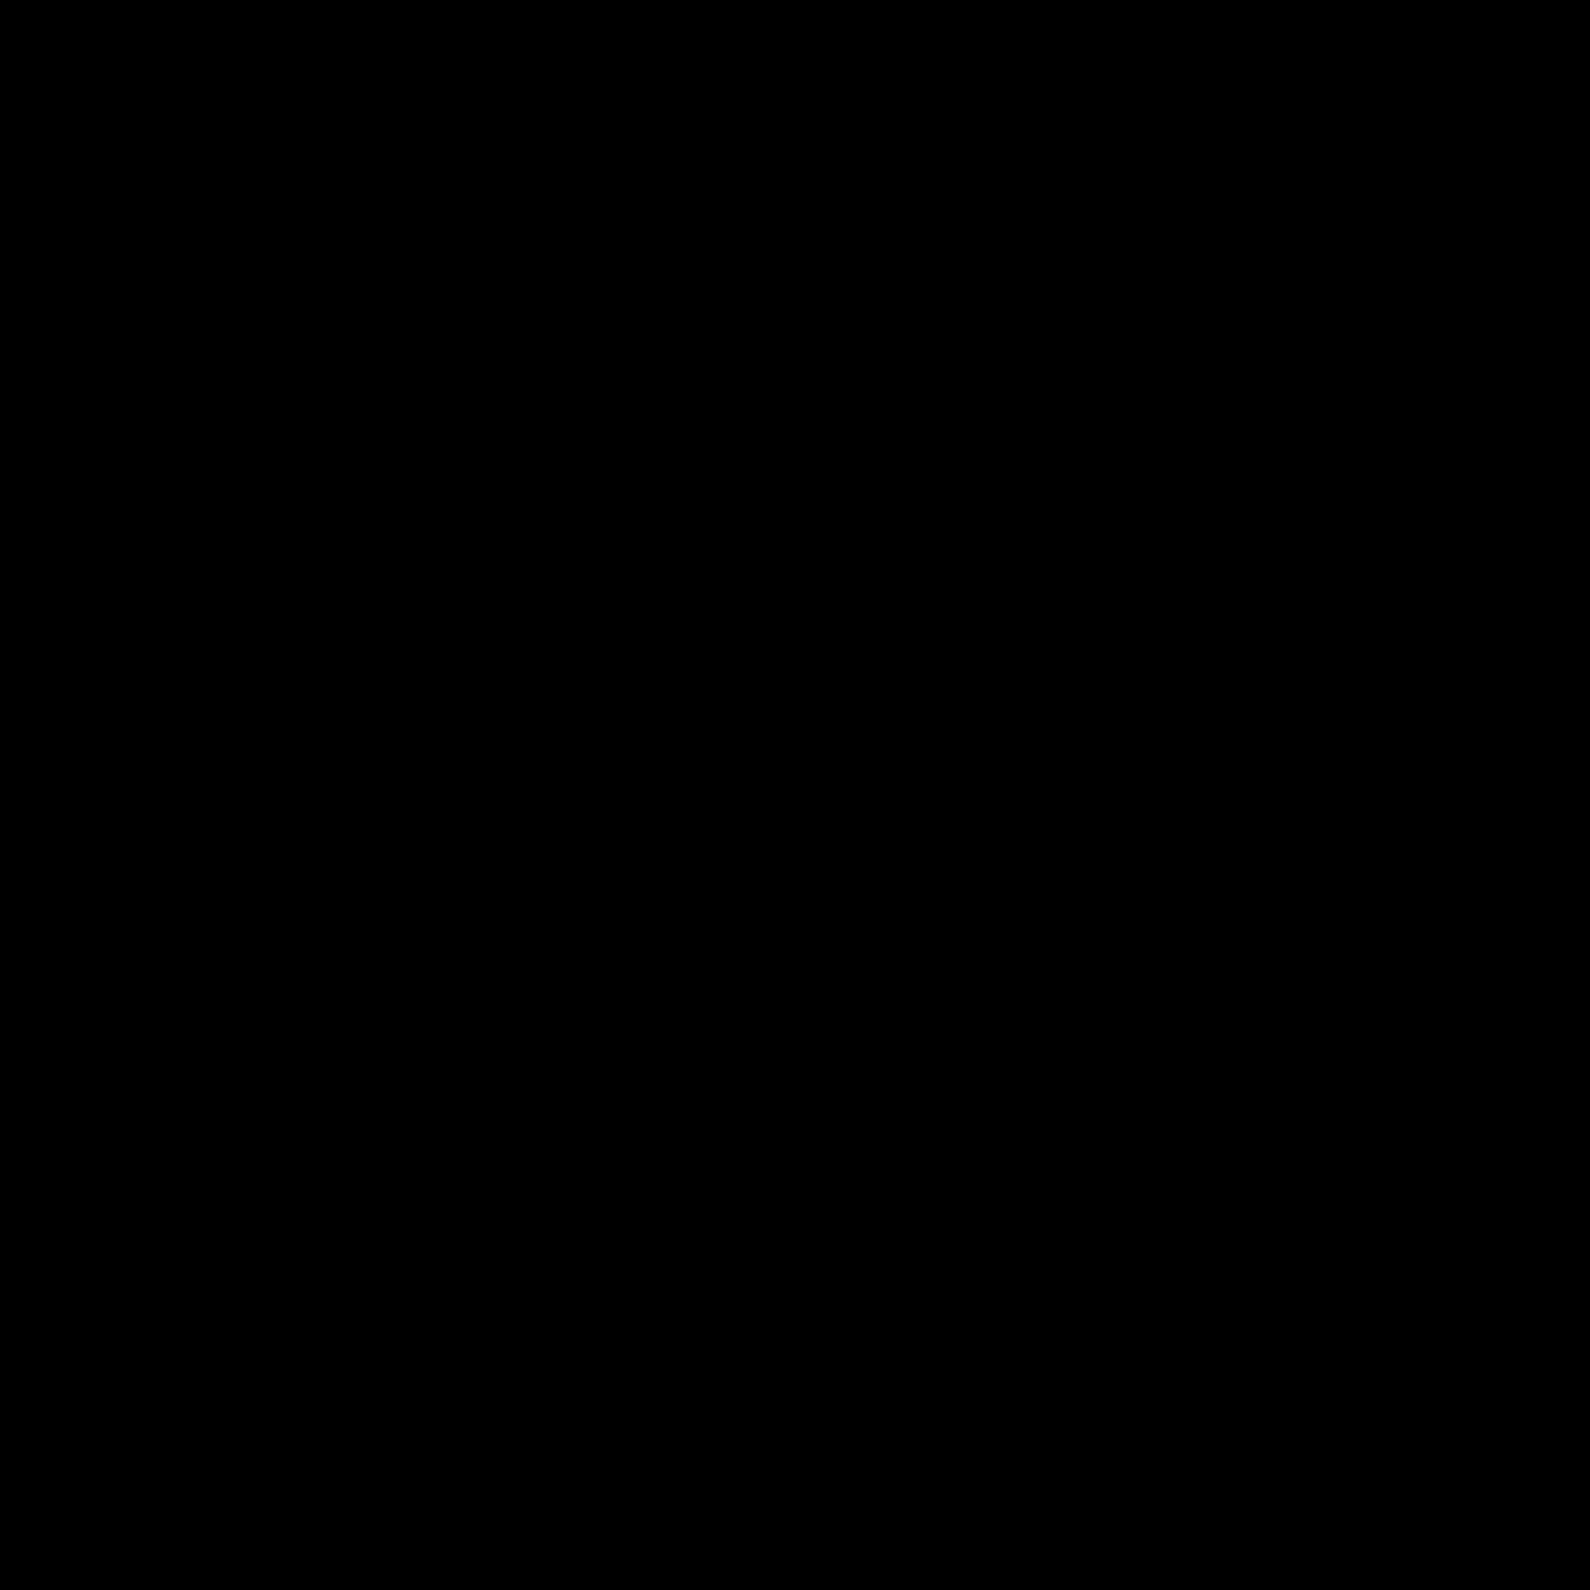 blurred-black-circle-png-3.png